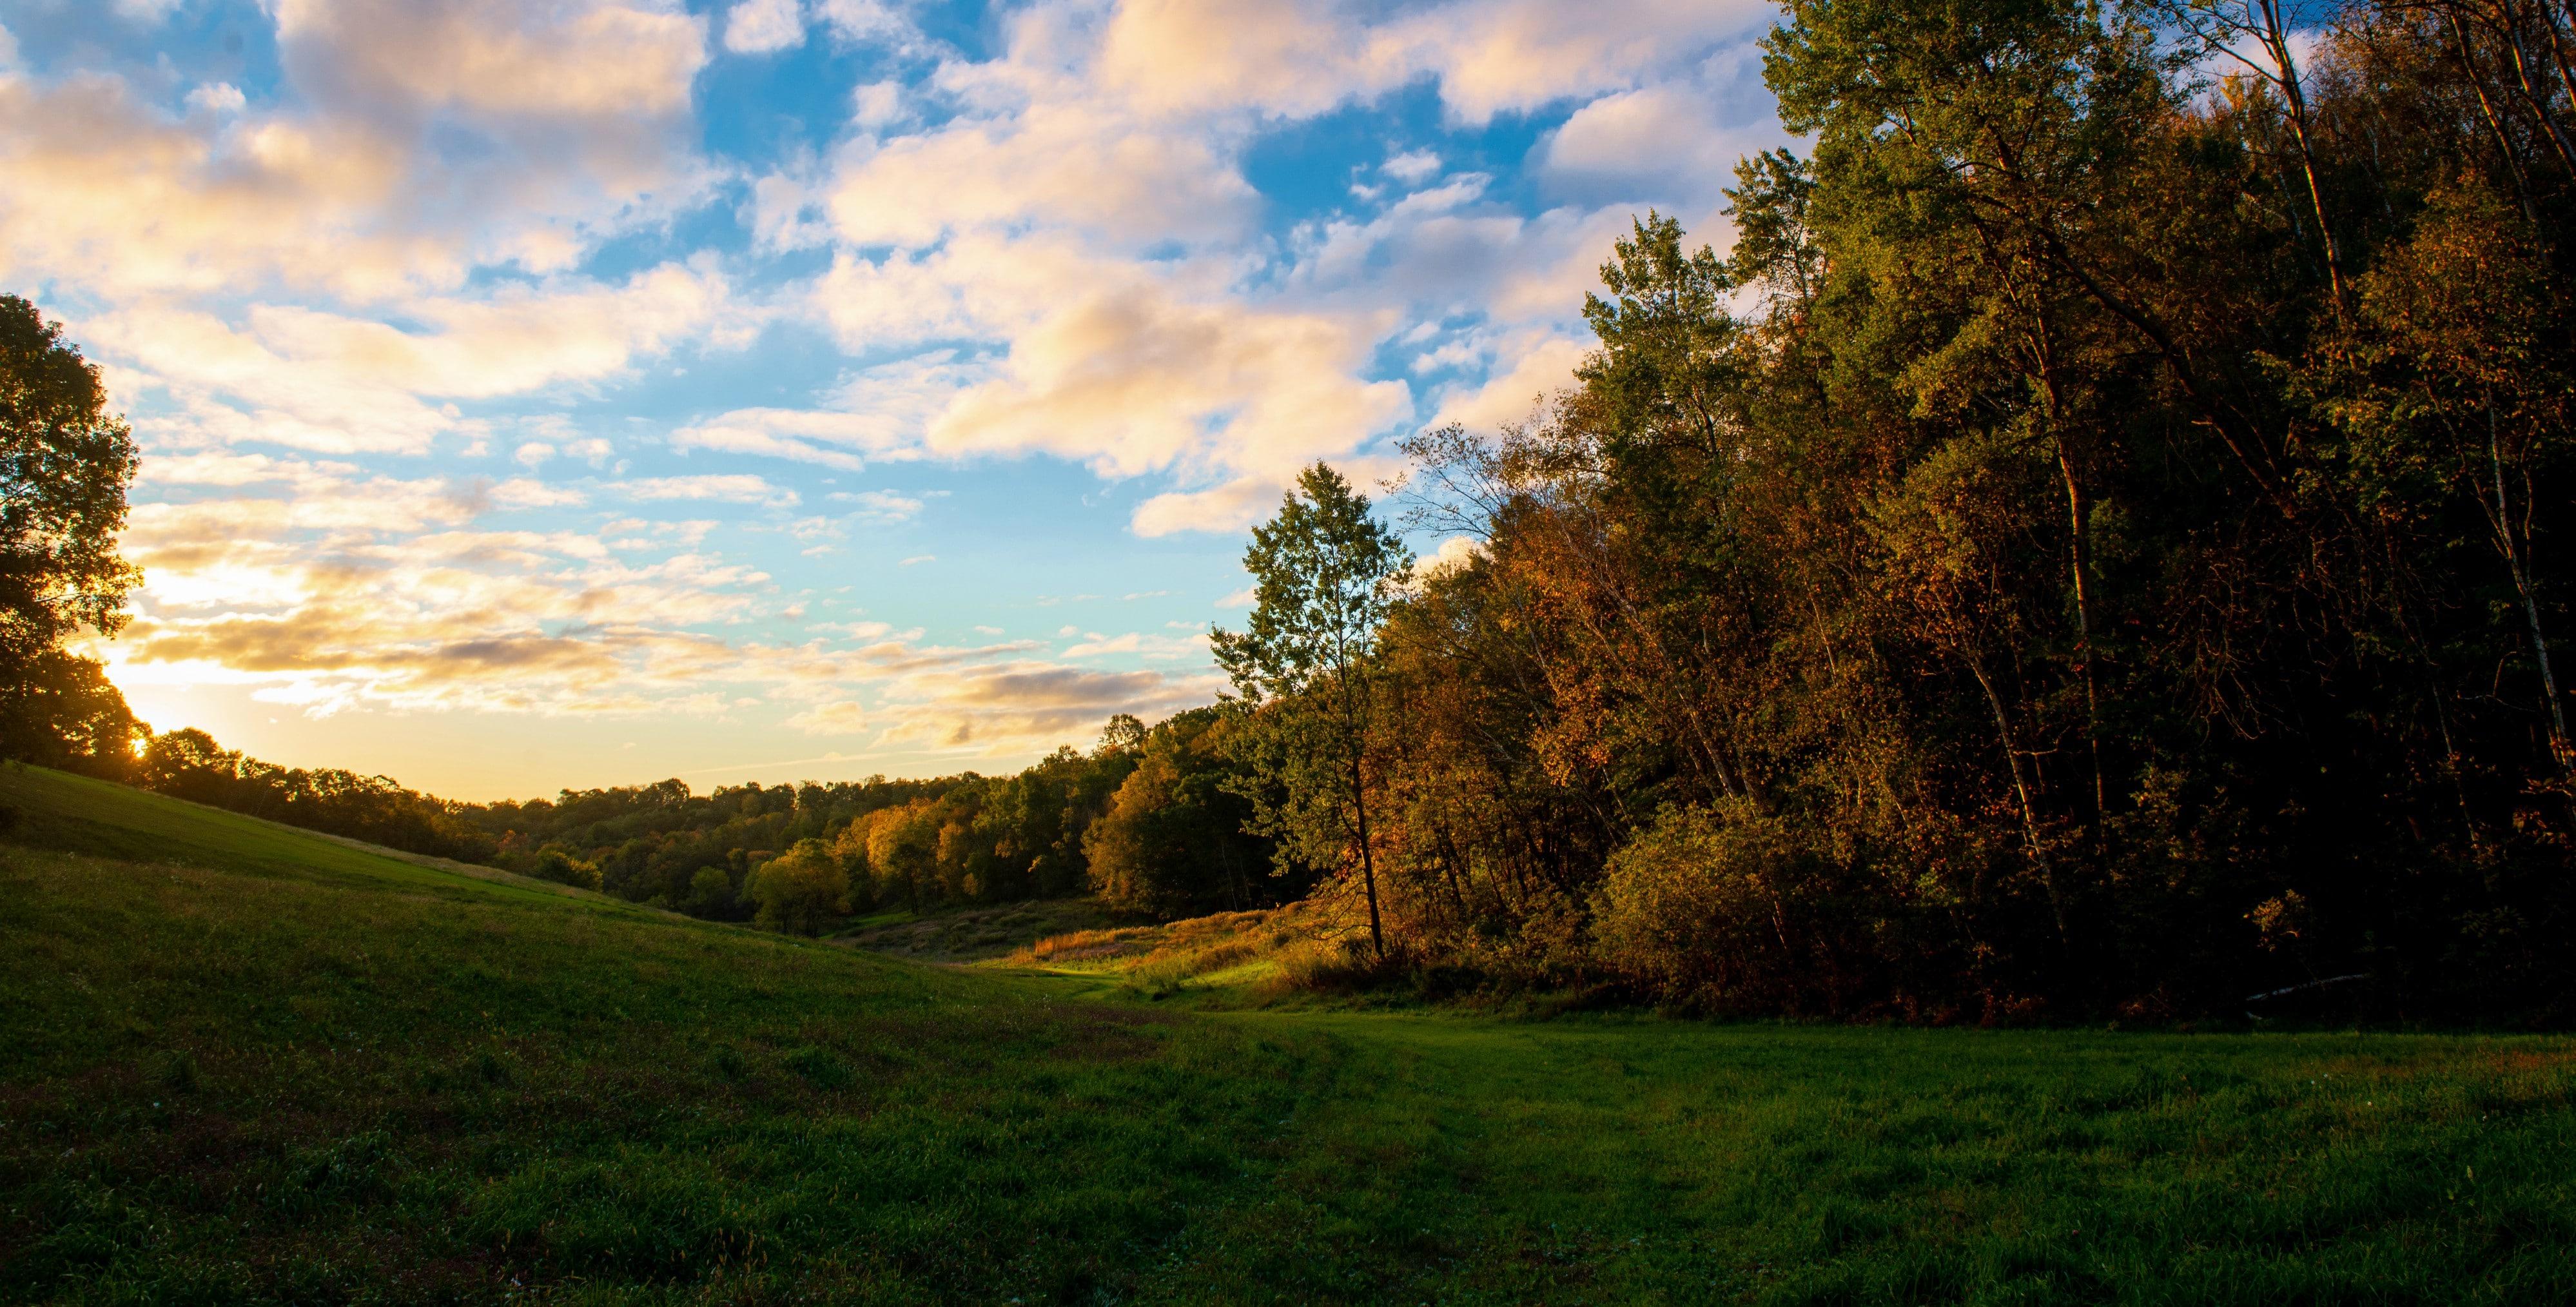 Valley during Fall Season Photo by Jason Ray